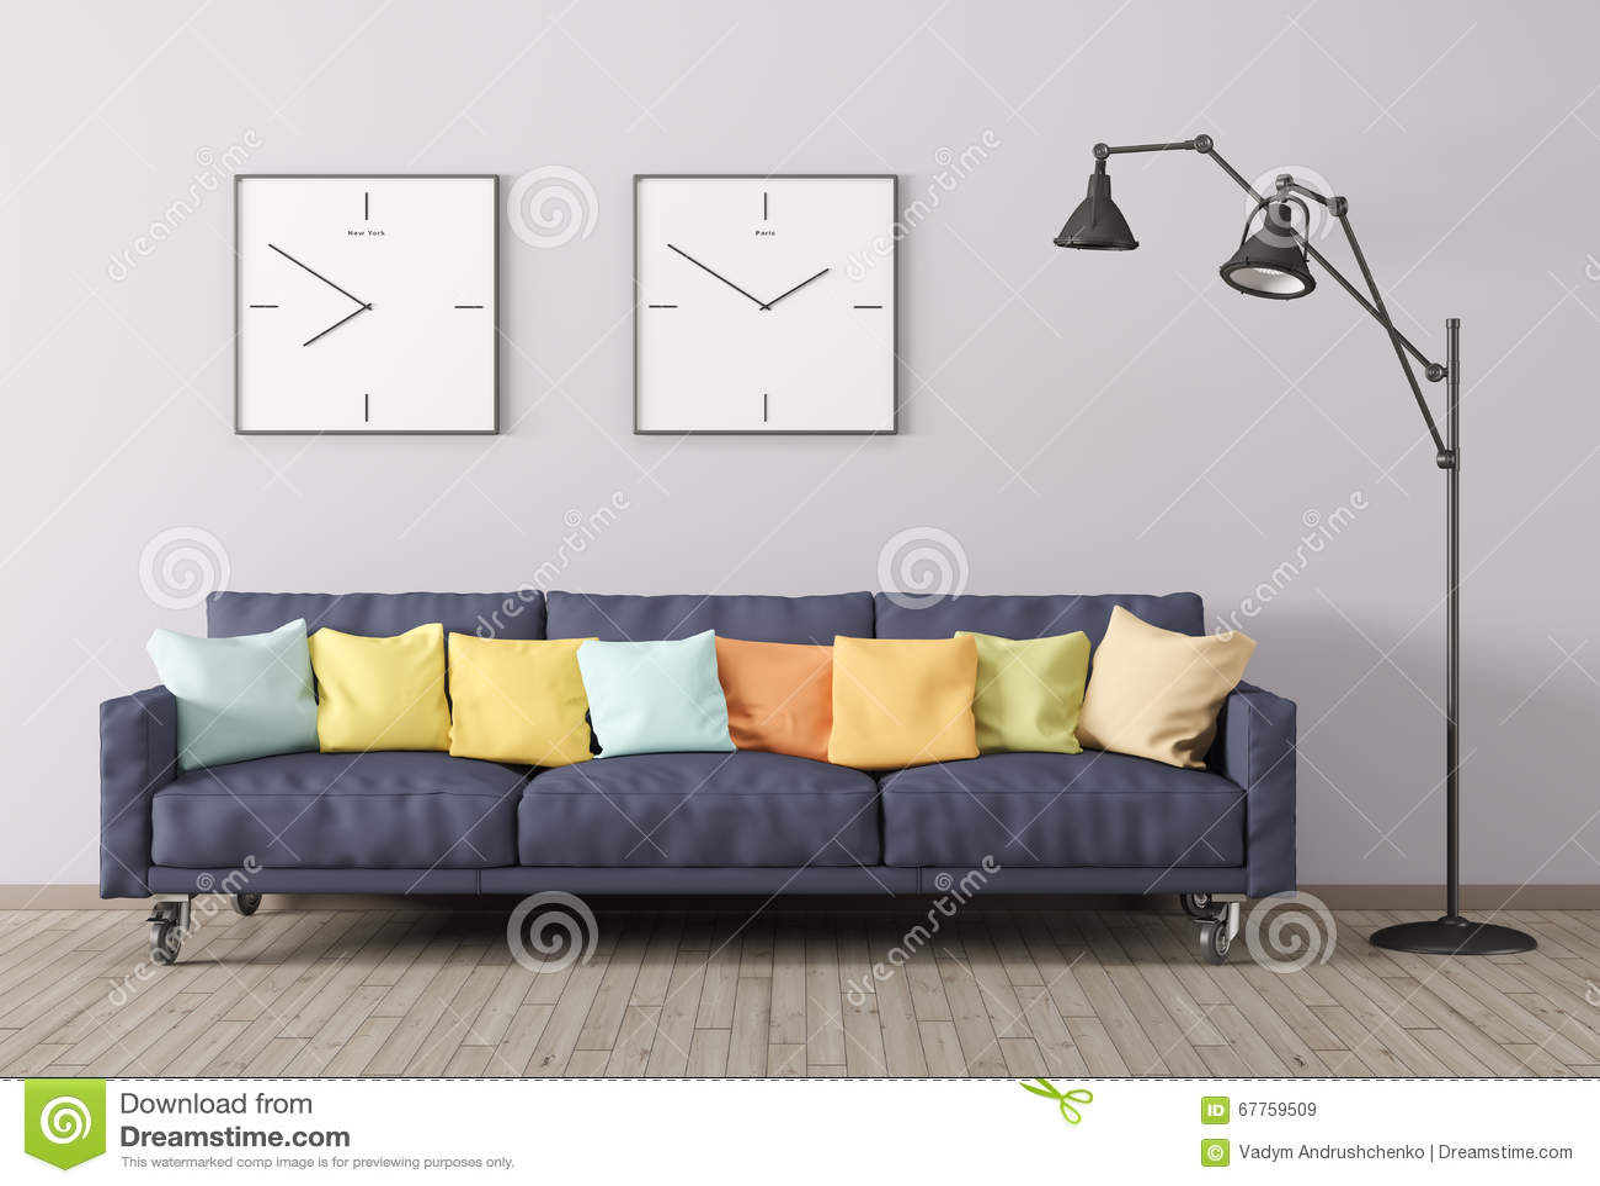 Woonkamer Staande Lamp : Het moderne binnenland van woonkamer met bank en d de staande